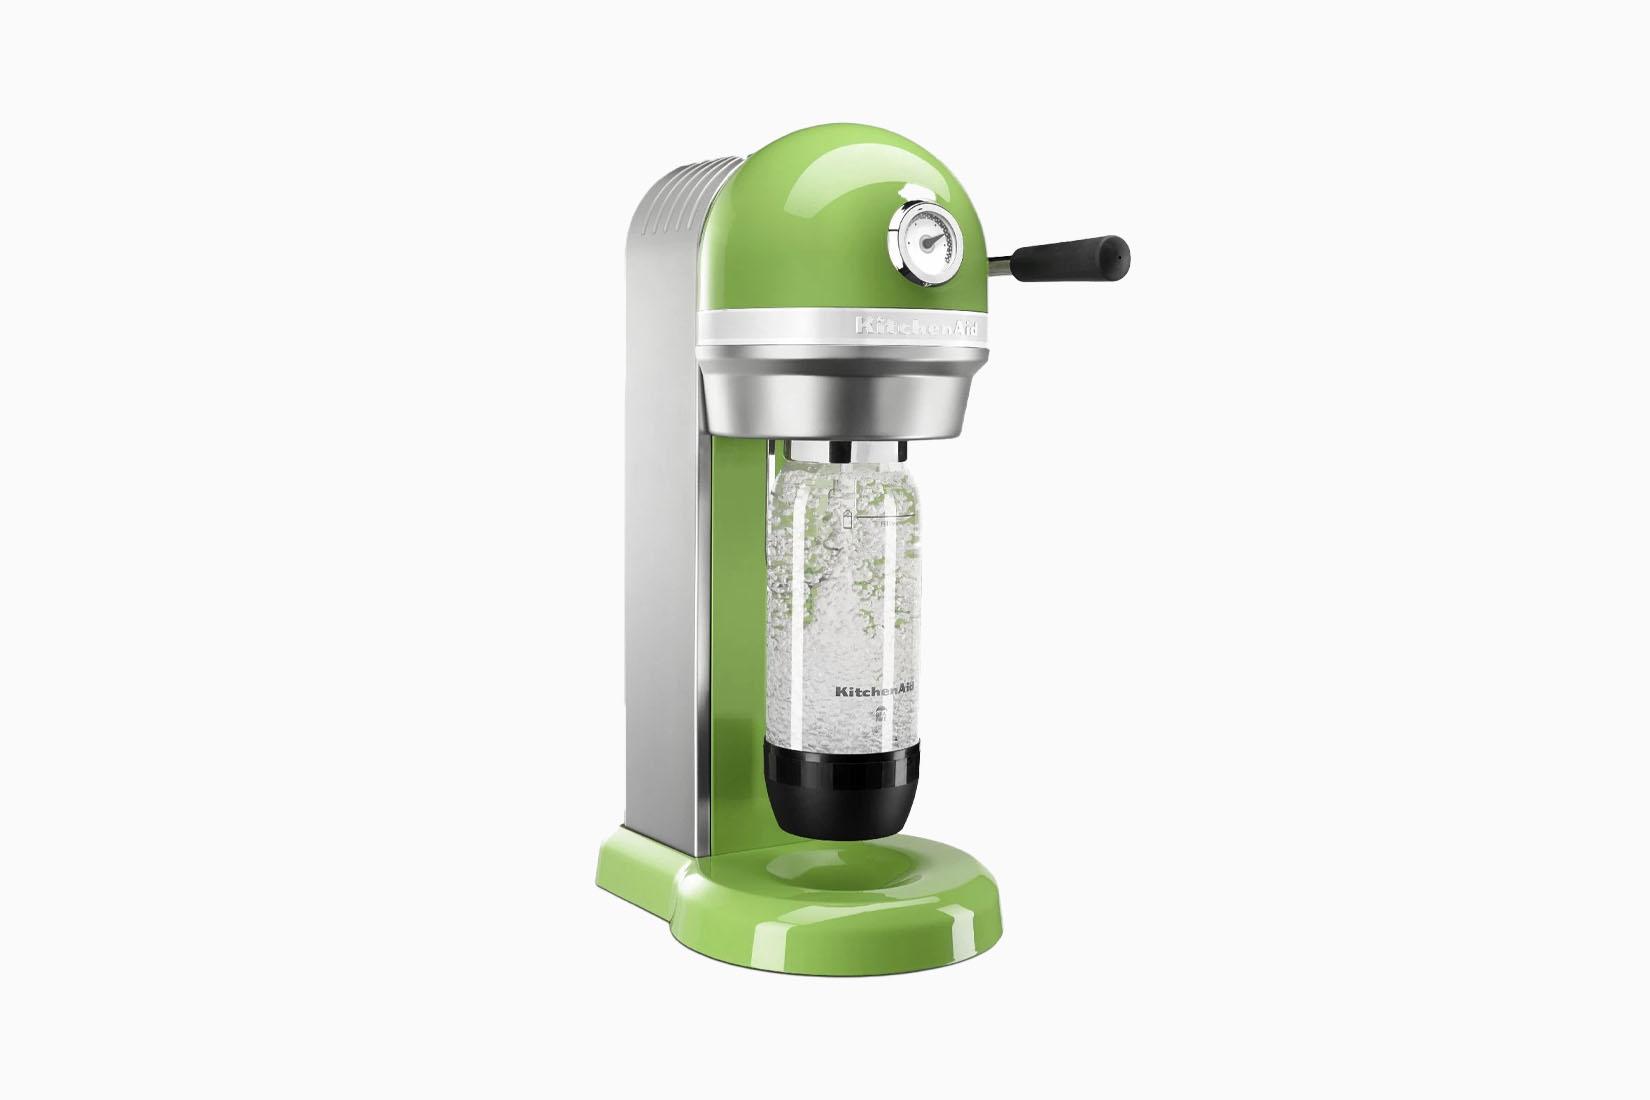 best soda maker kitchenaid review Luxe Digital